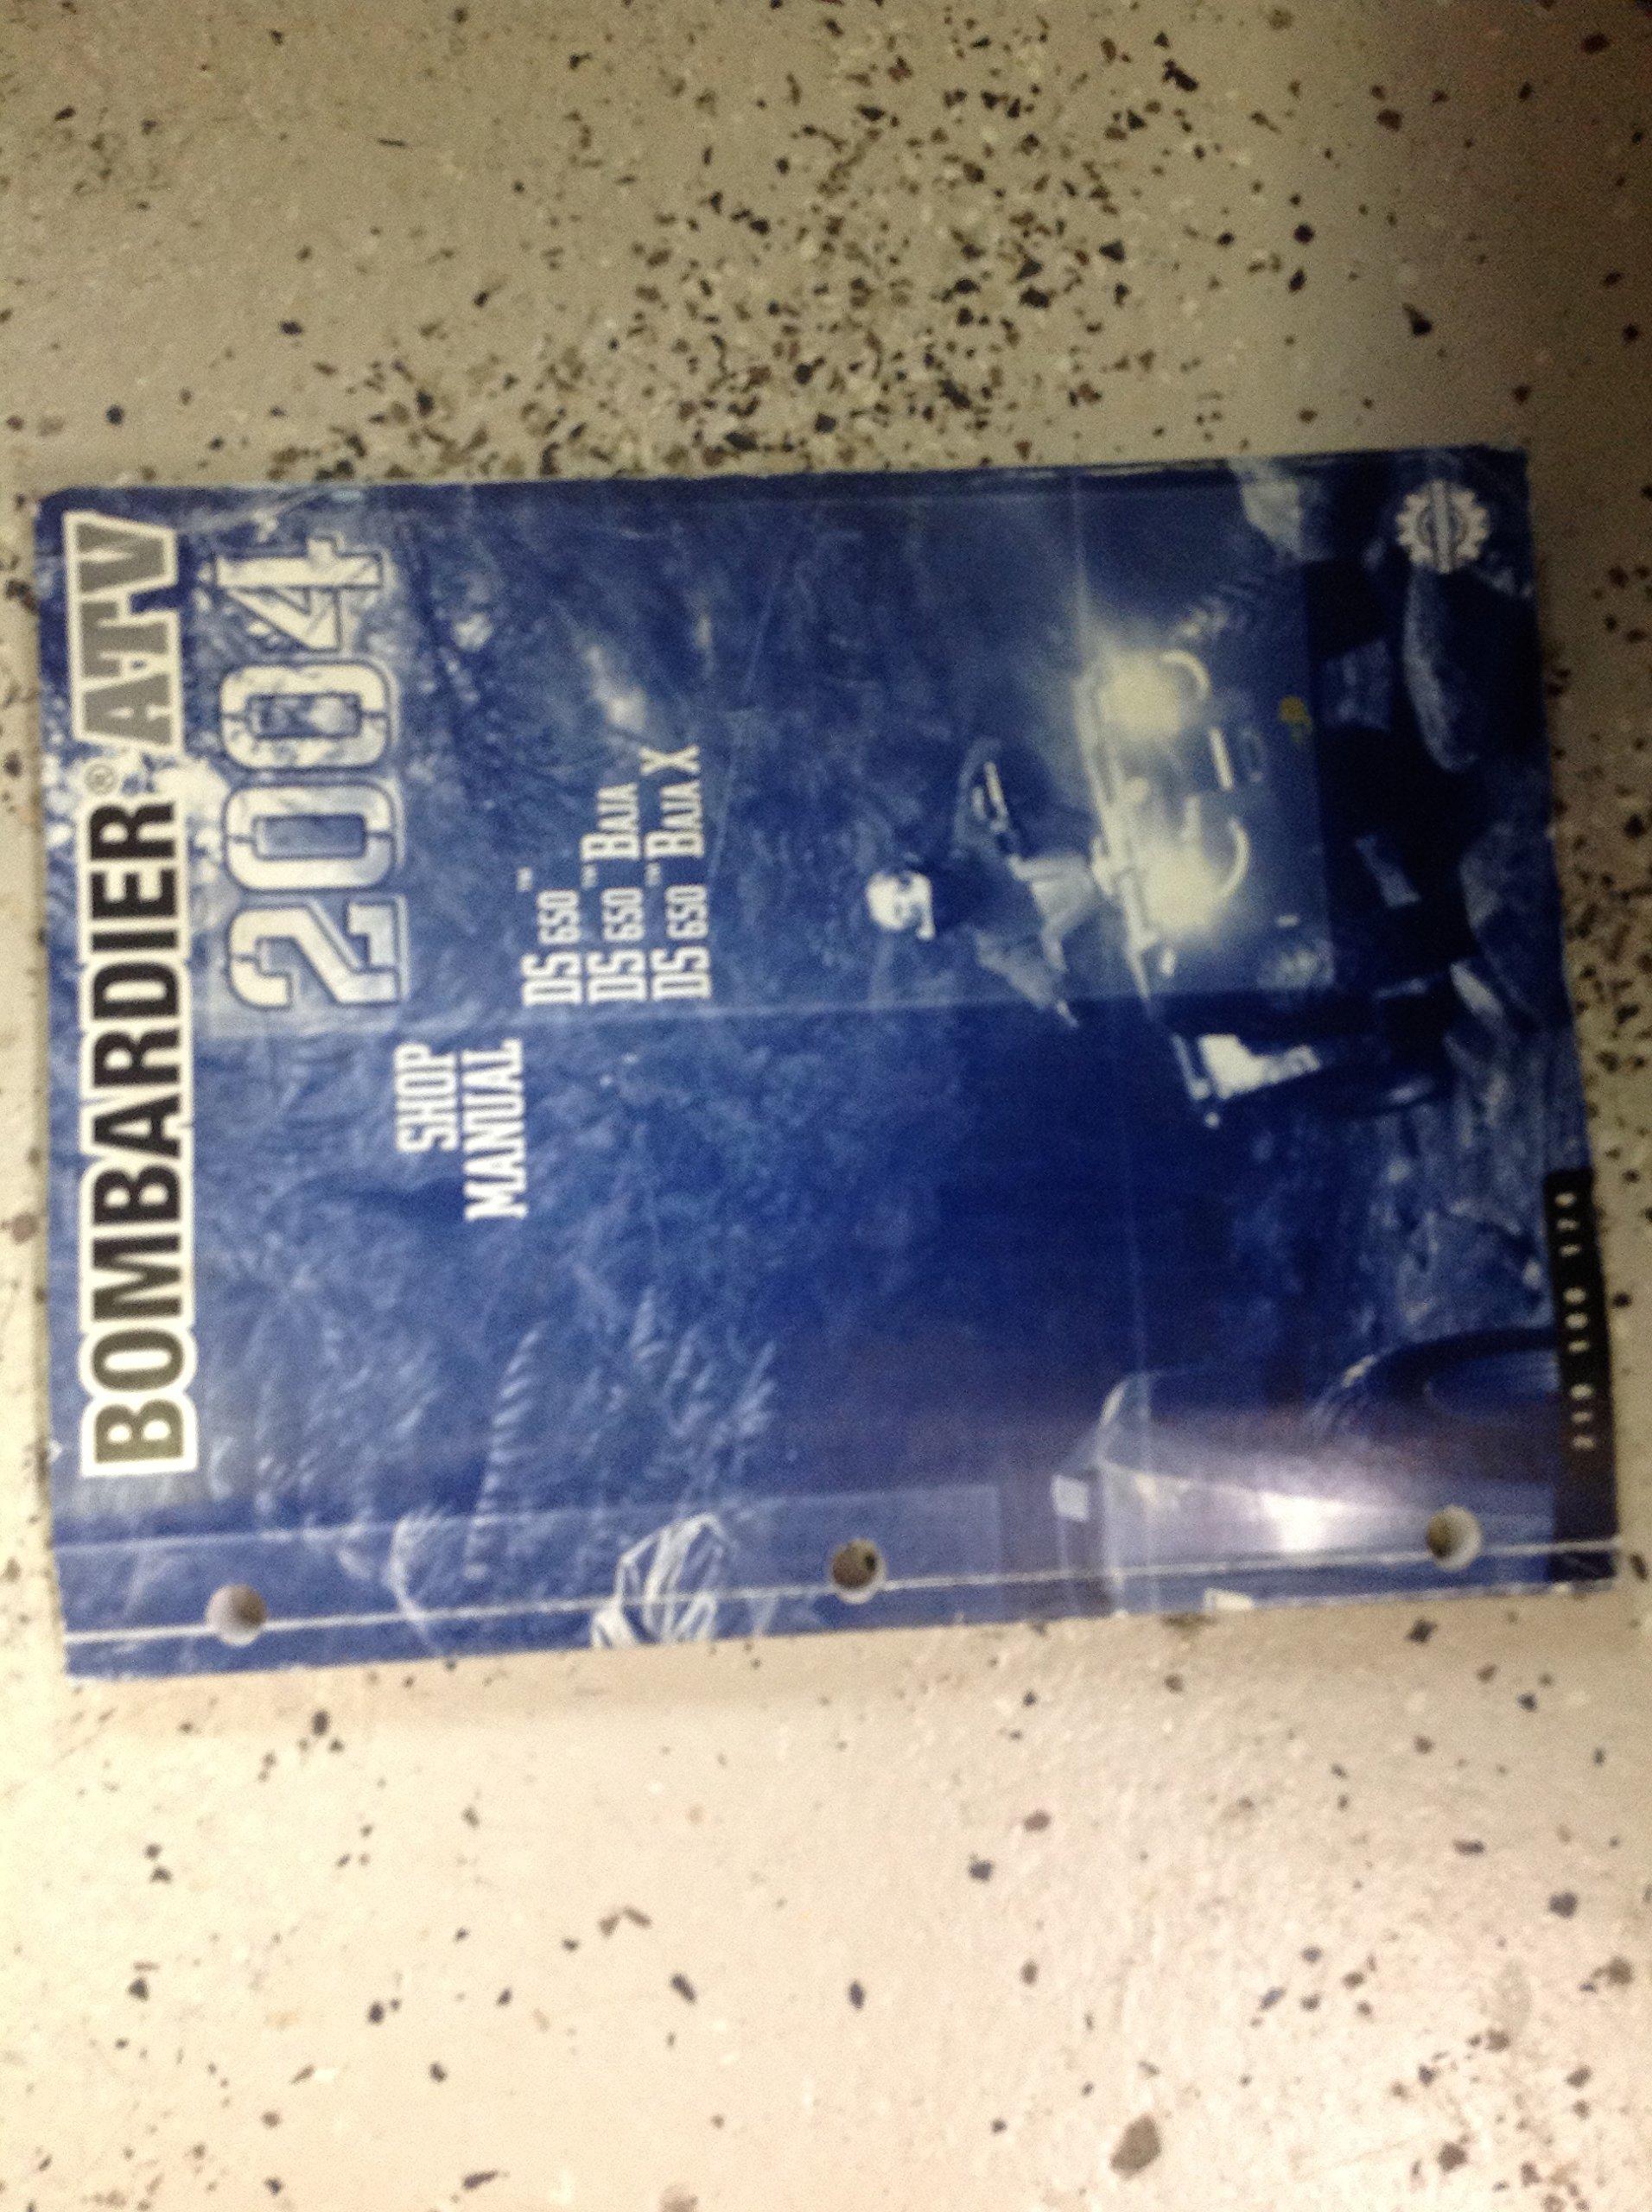 2004 BOMBARDIER DS 650 BAJA Service Shop Repair Manual OEM BOOK FACTORY:  BOMBARDIER: Amazon.com: Books